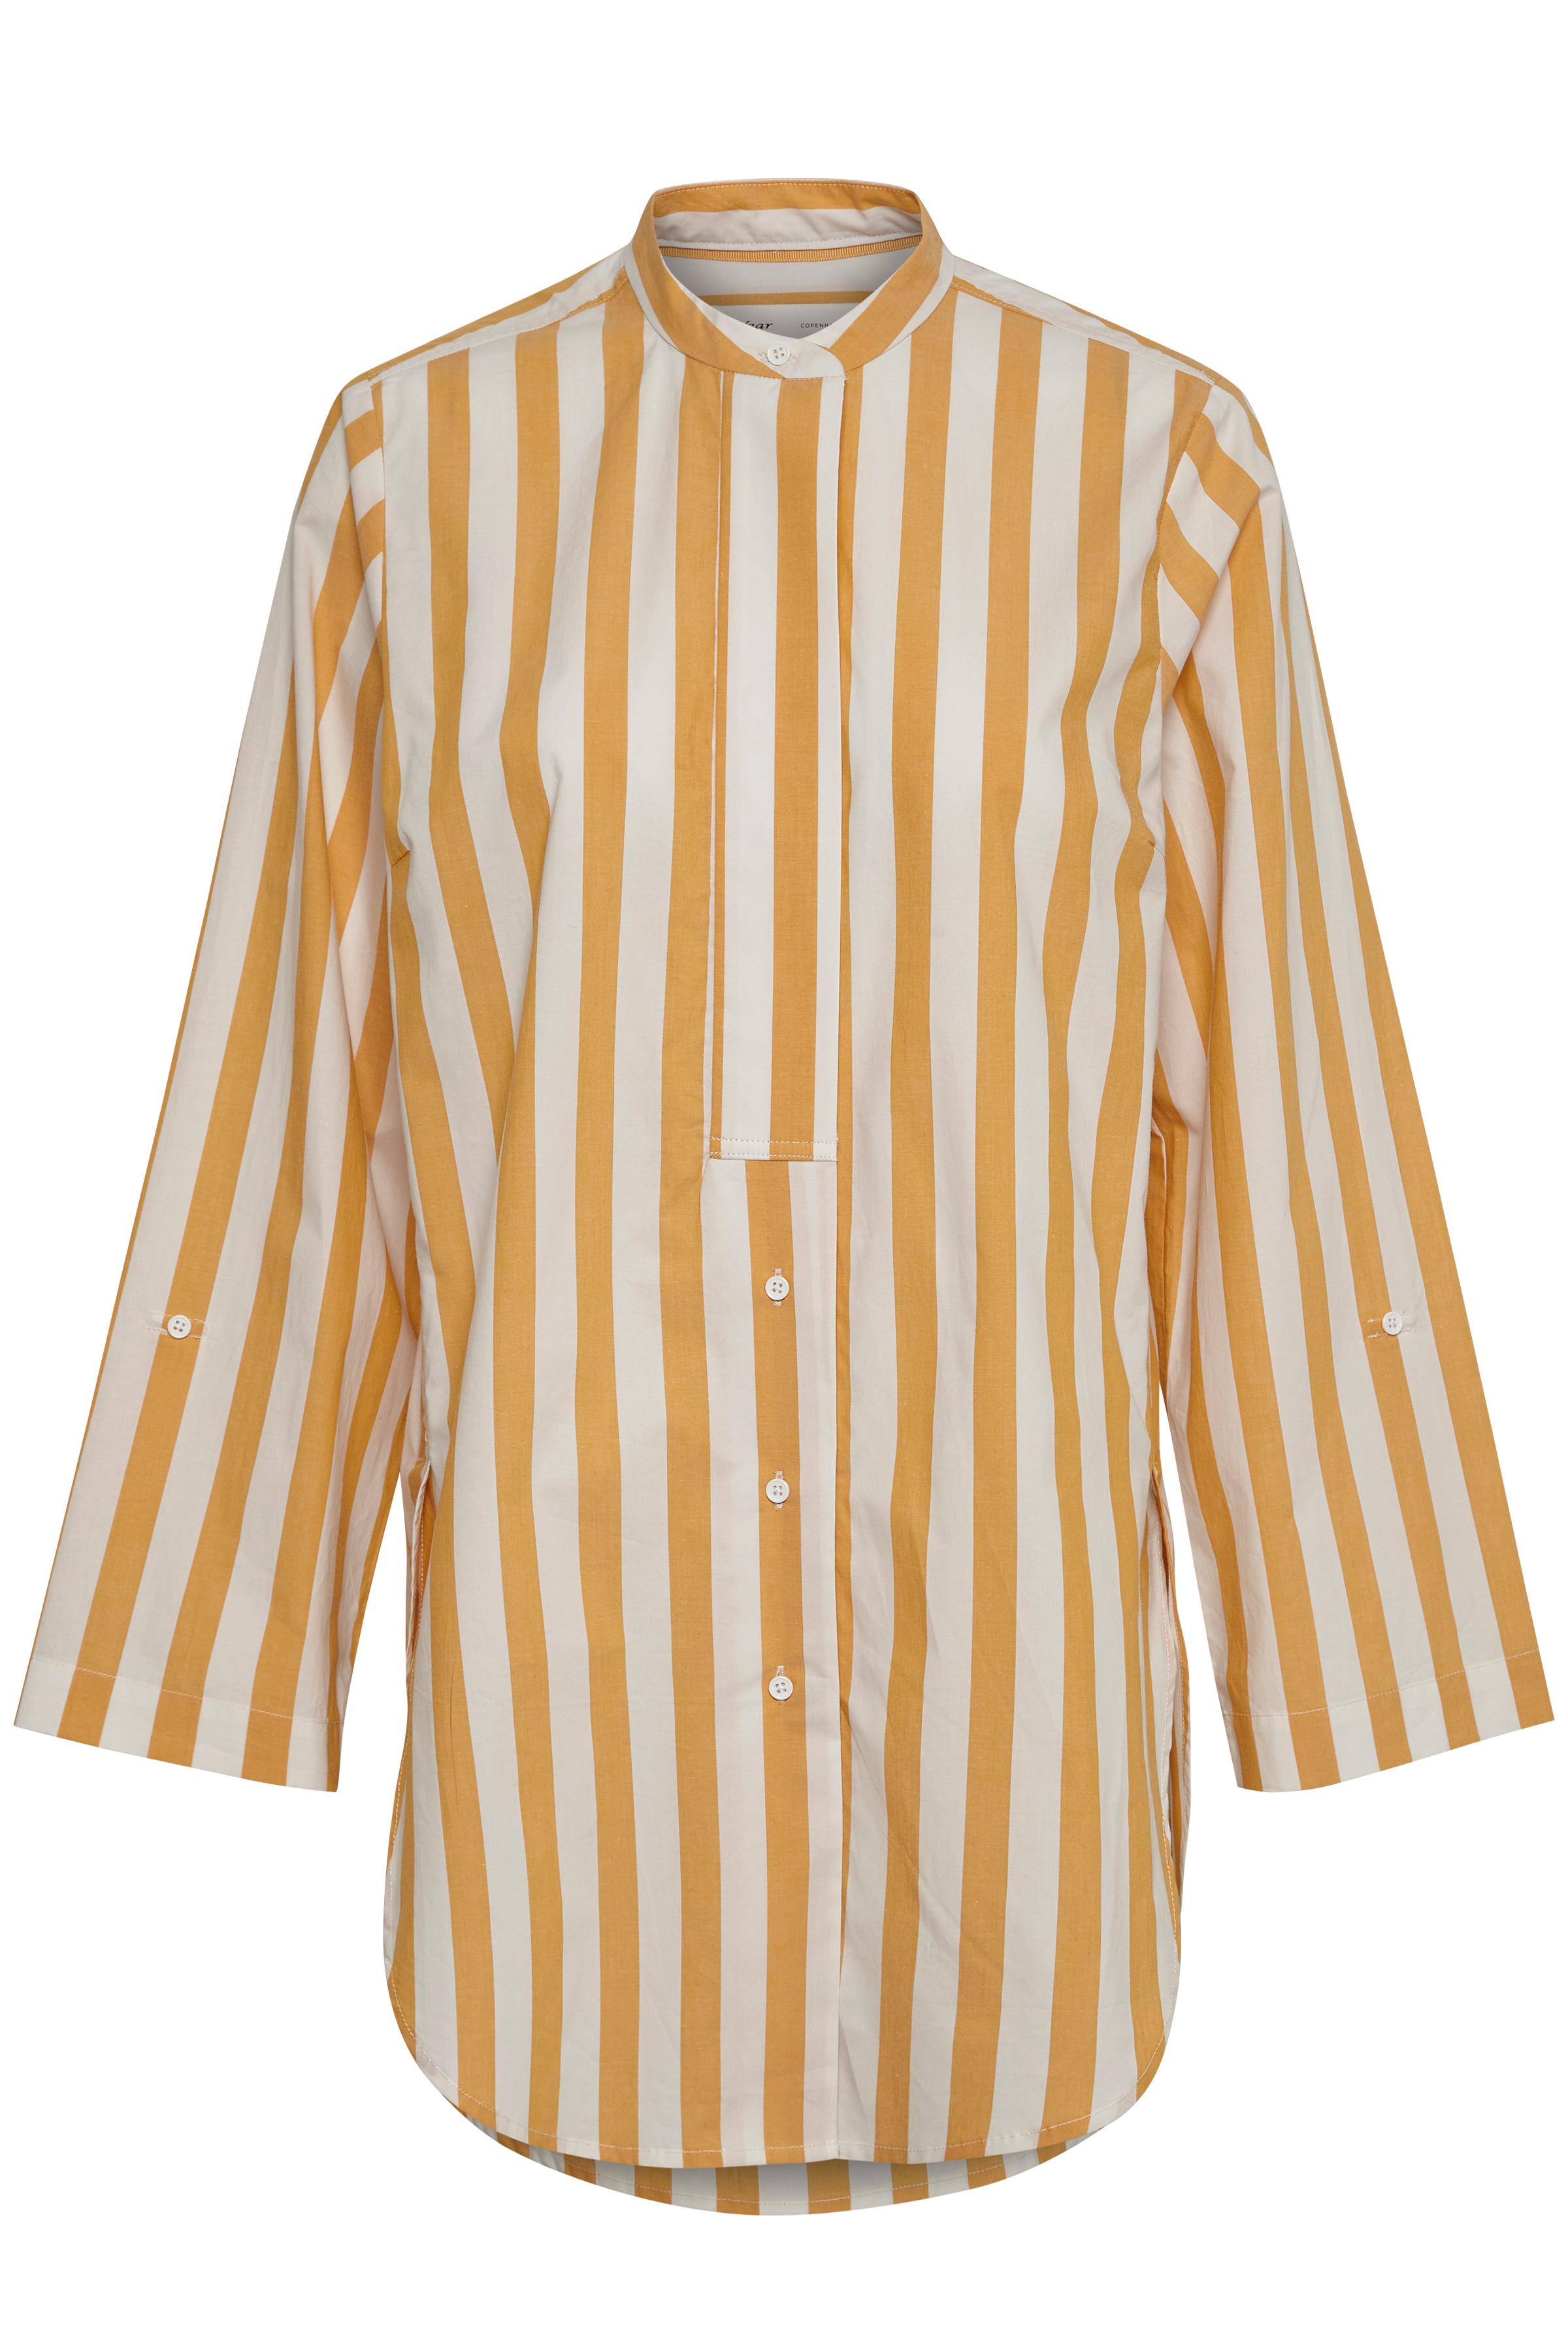 Sunny Yellow Blocking Stripe